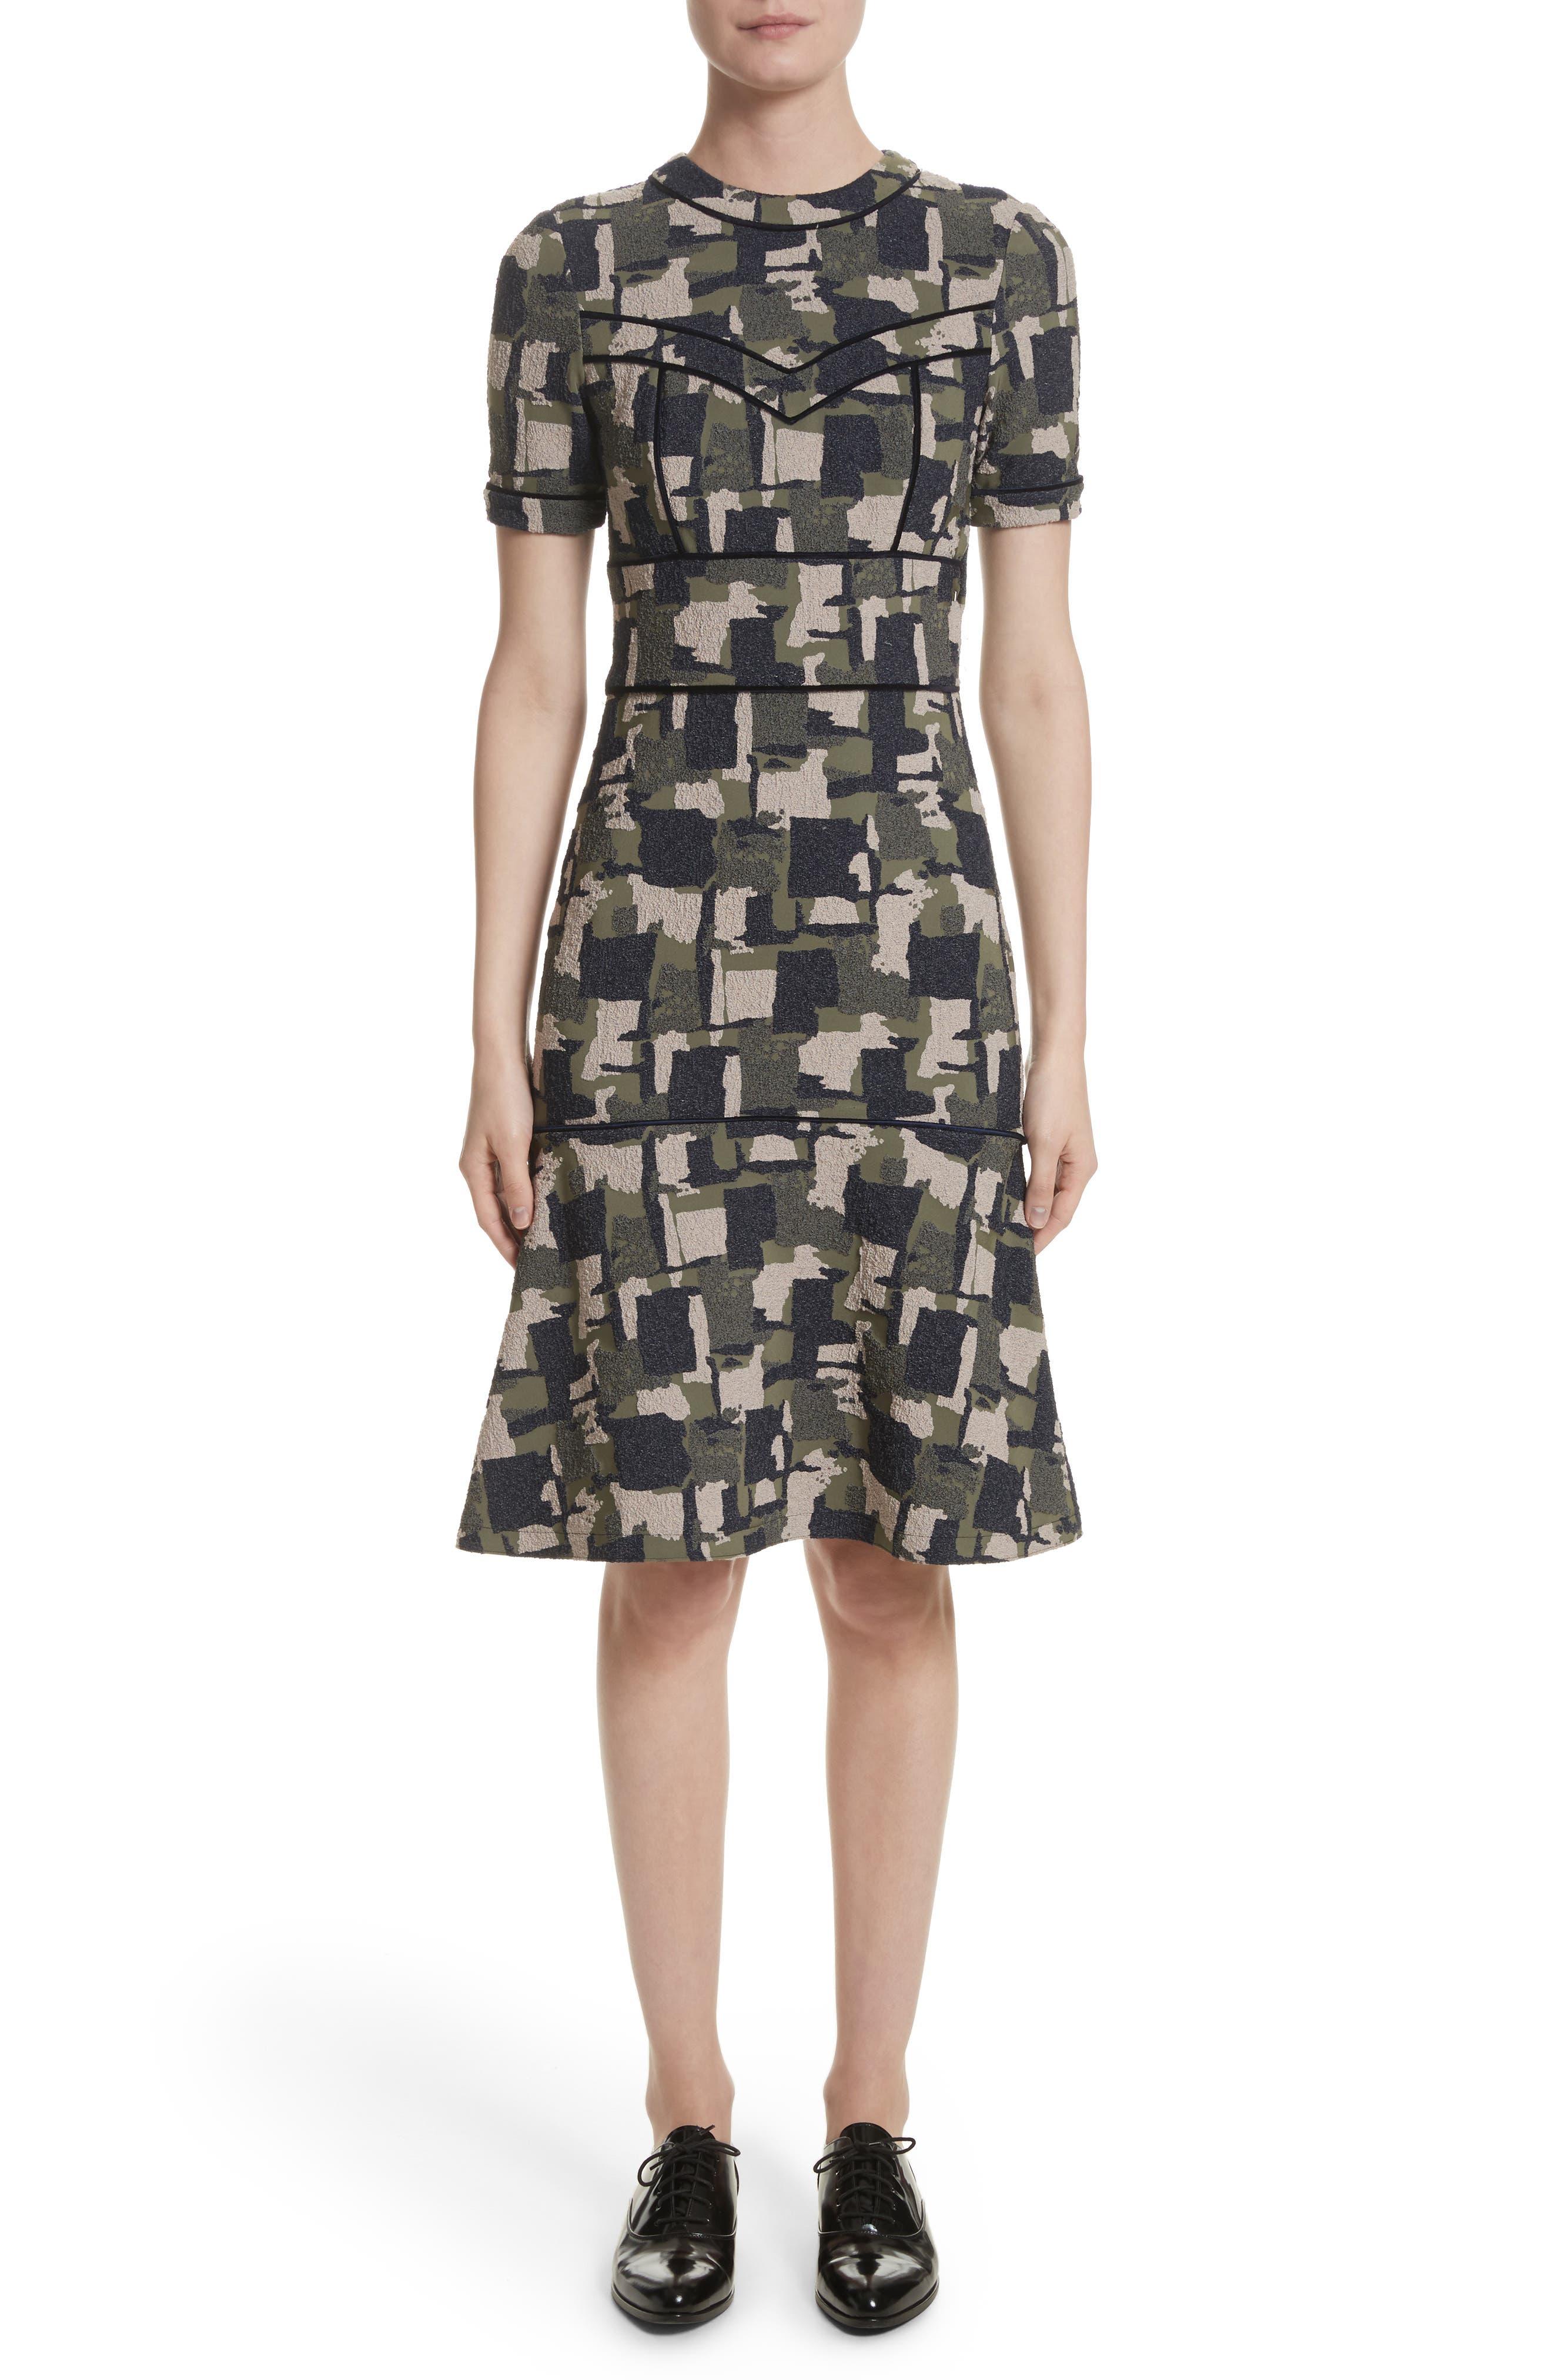 Yigal Azrouël Patchwork Stretch Jacquard Dress